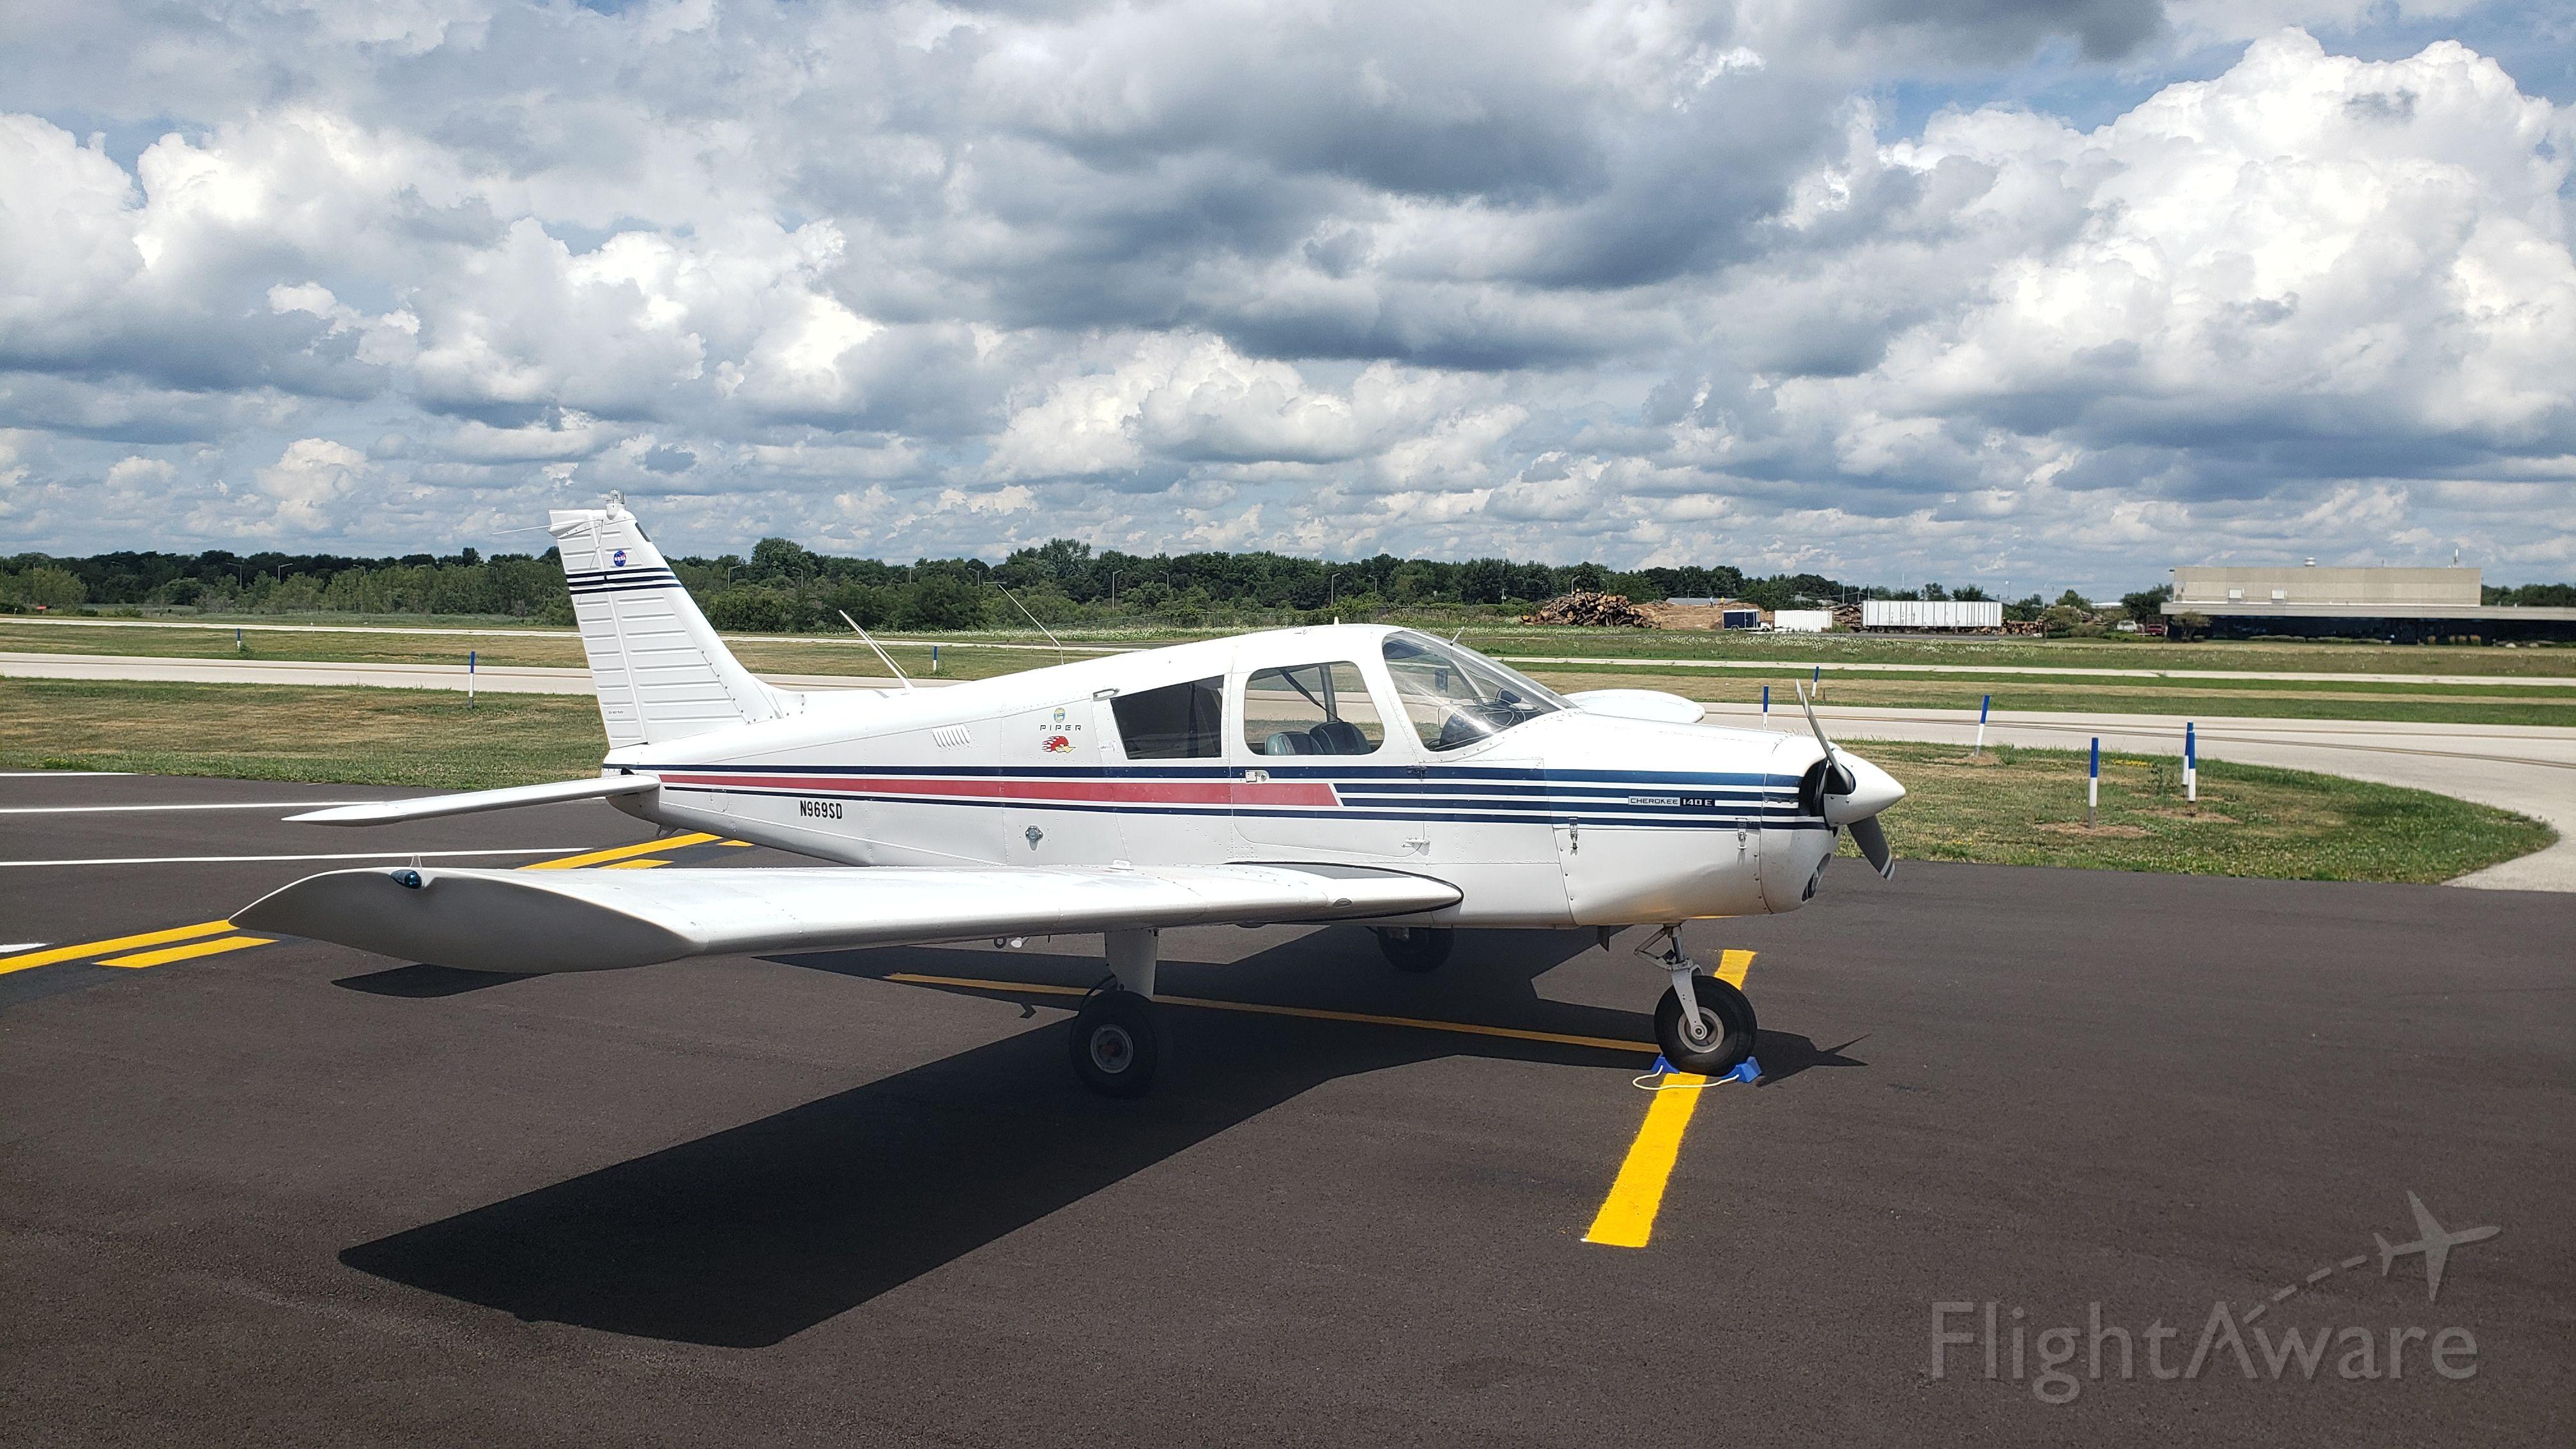 Piper Cherokee (N969SD)